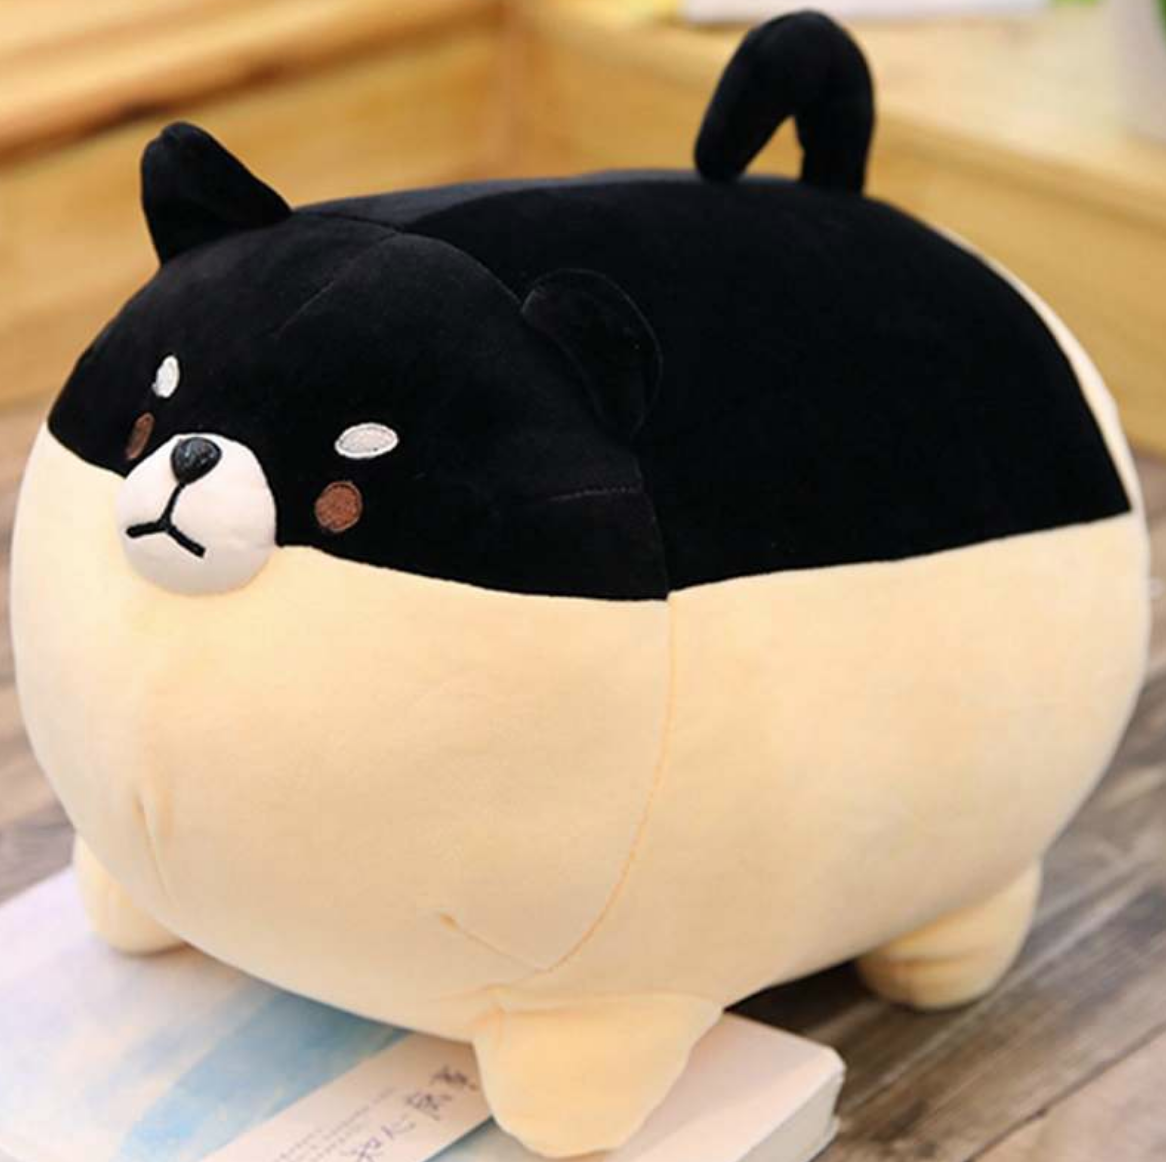 Chubby Shiba Inu Black Plush